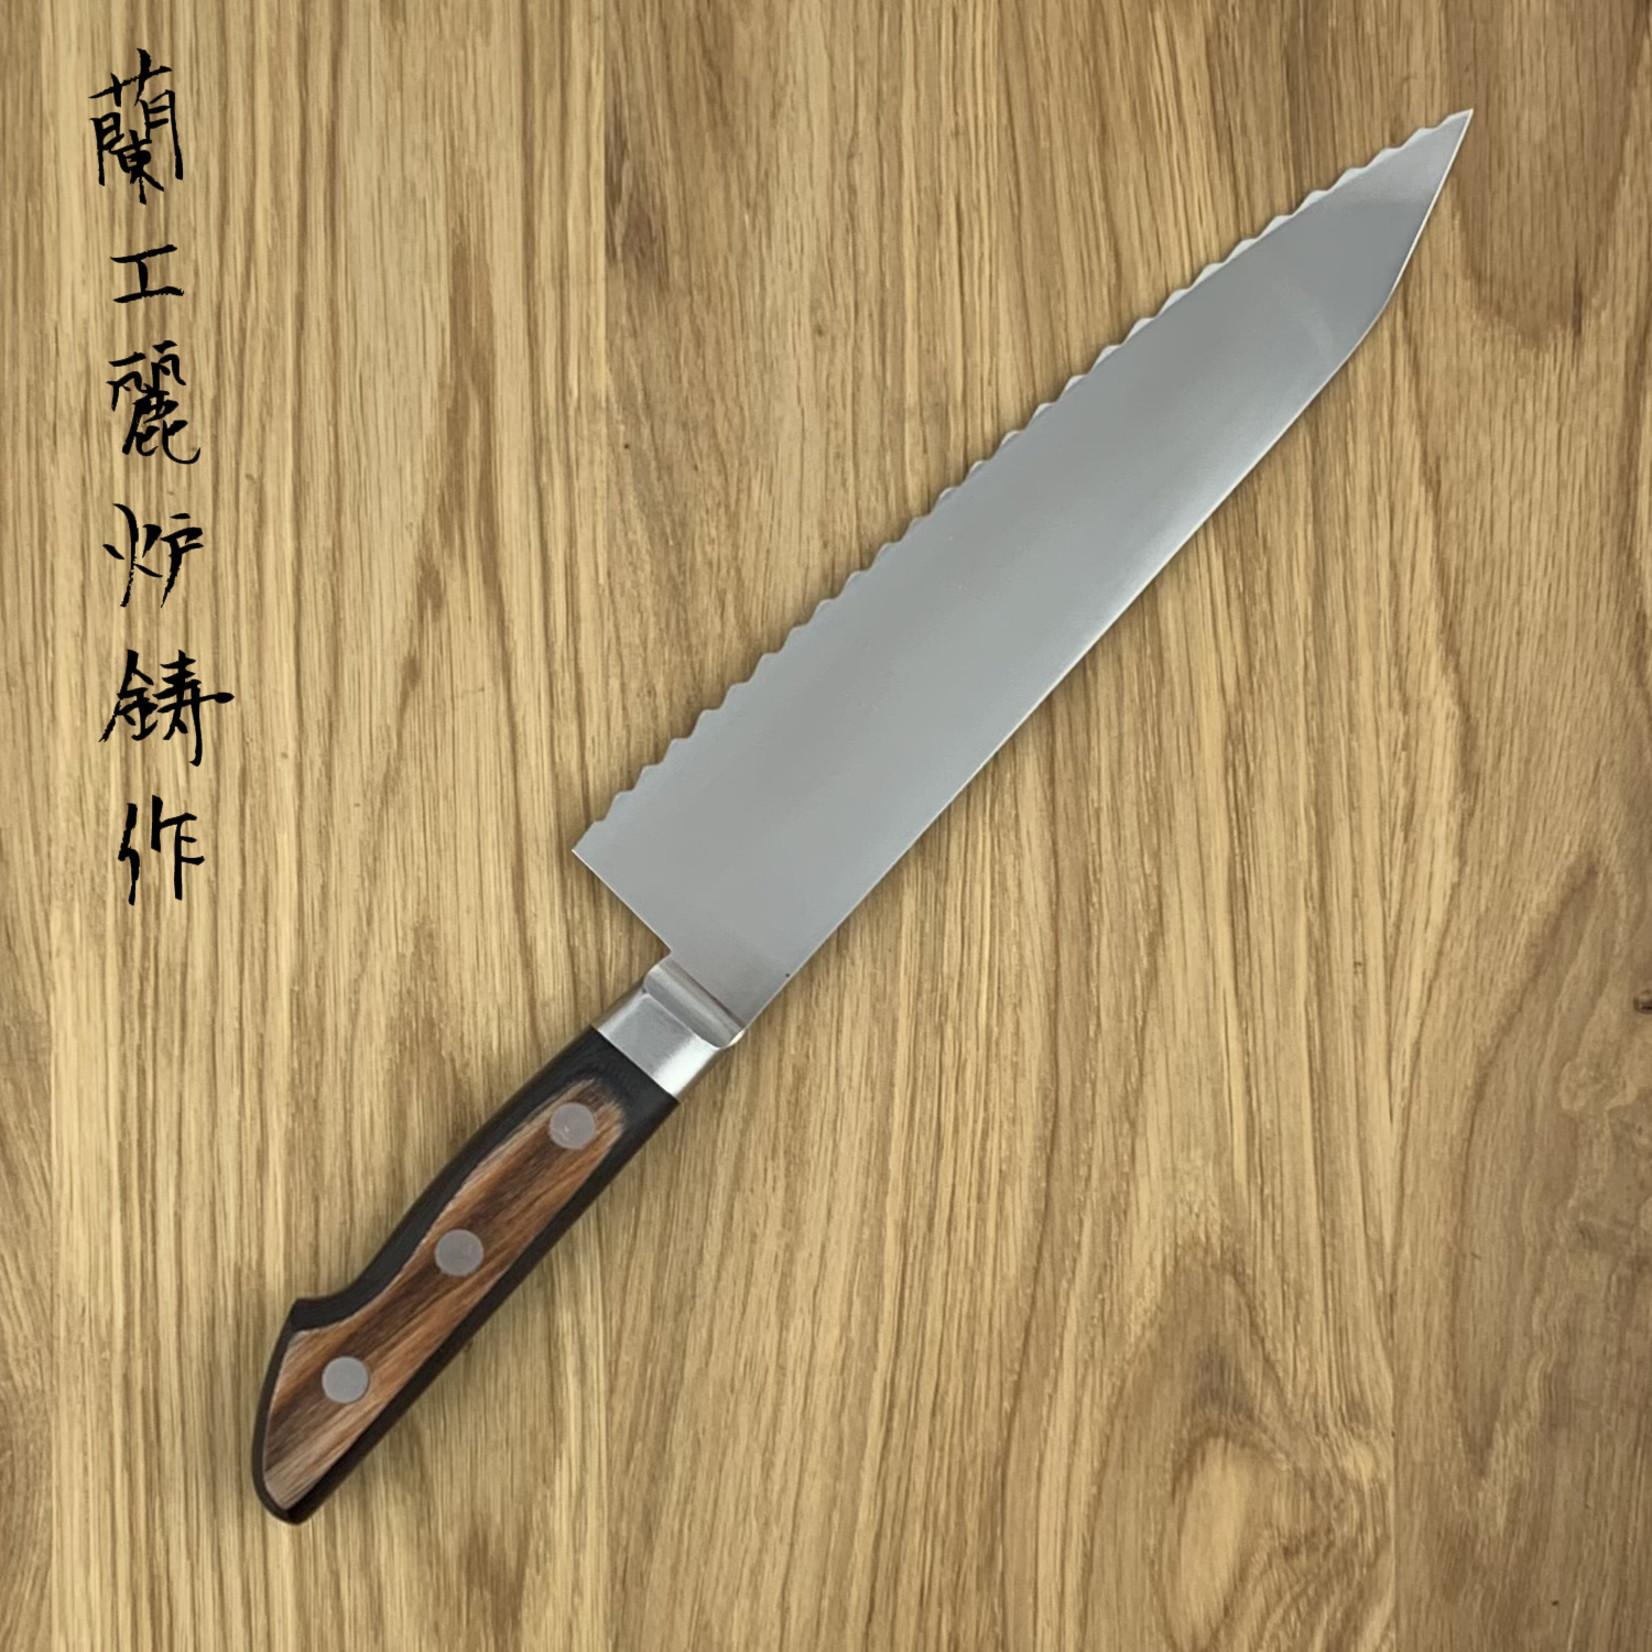 SAKAI TAKAYUKI TUS Gyuto Bread 210 mm